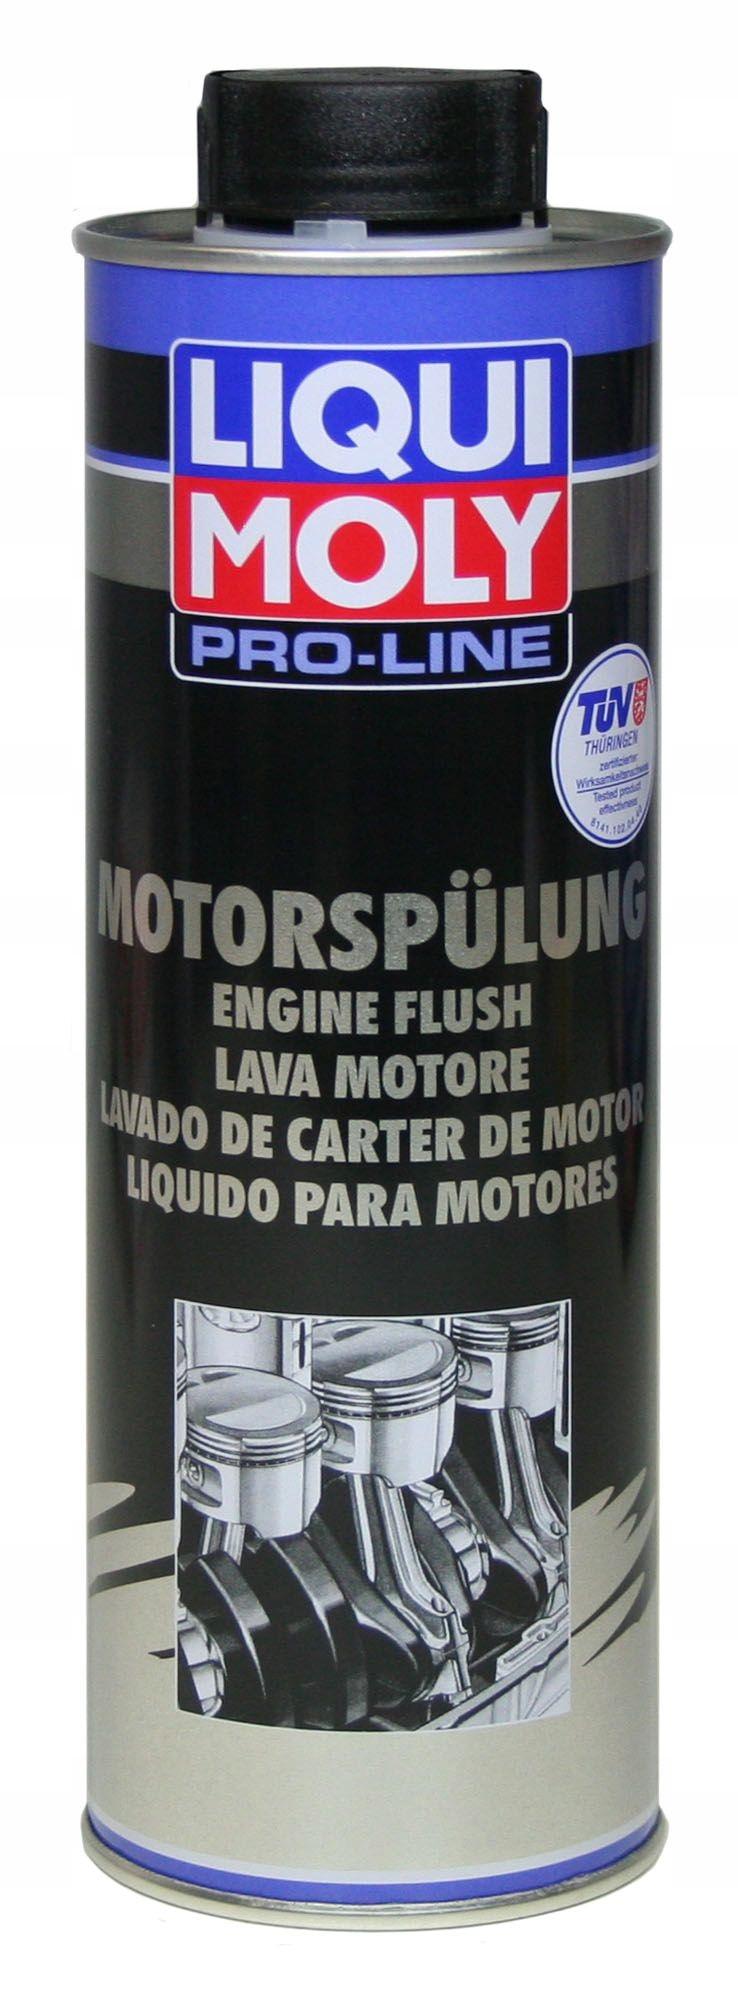 Промывка двигателя Liqui Moly Pro Line 2662 Rinse